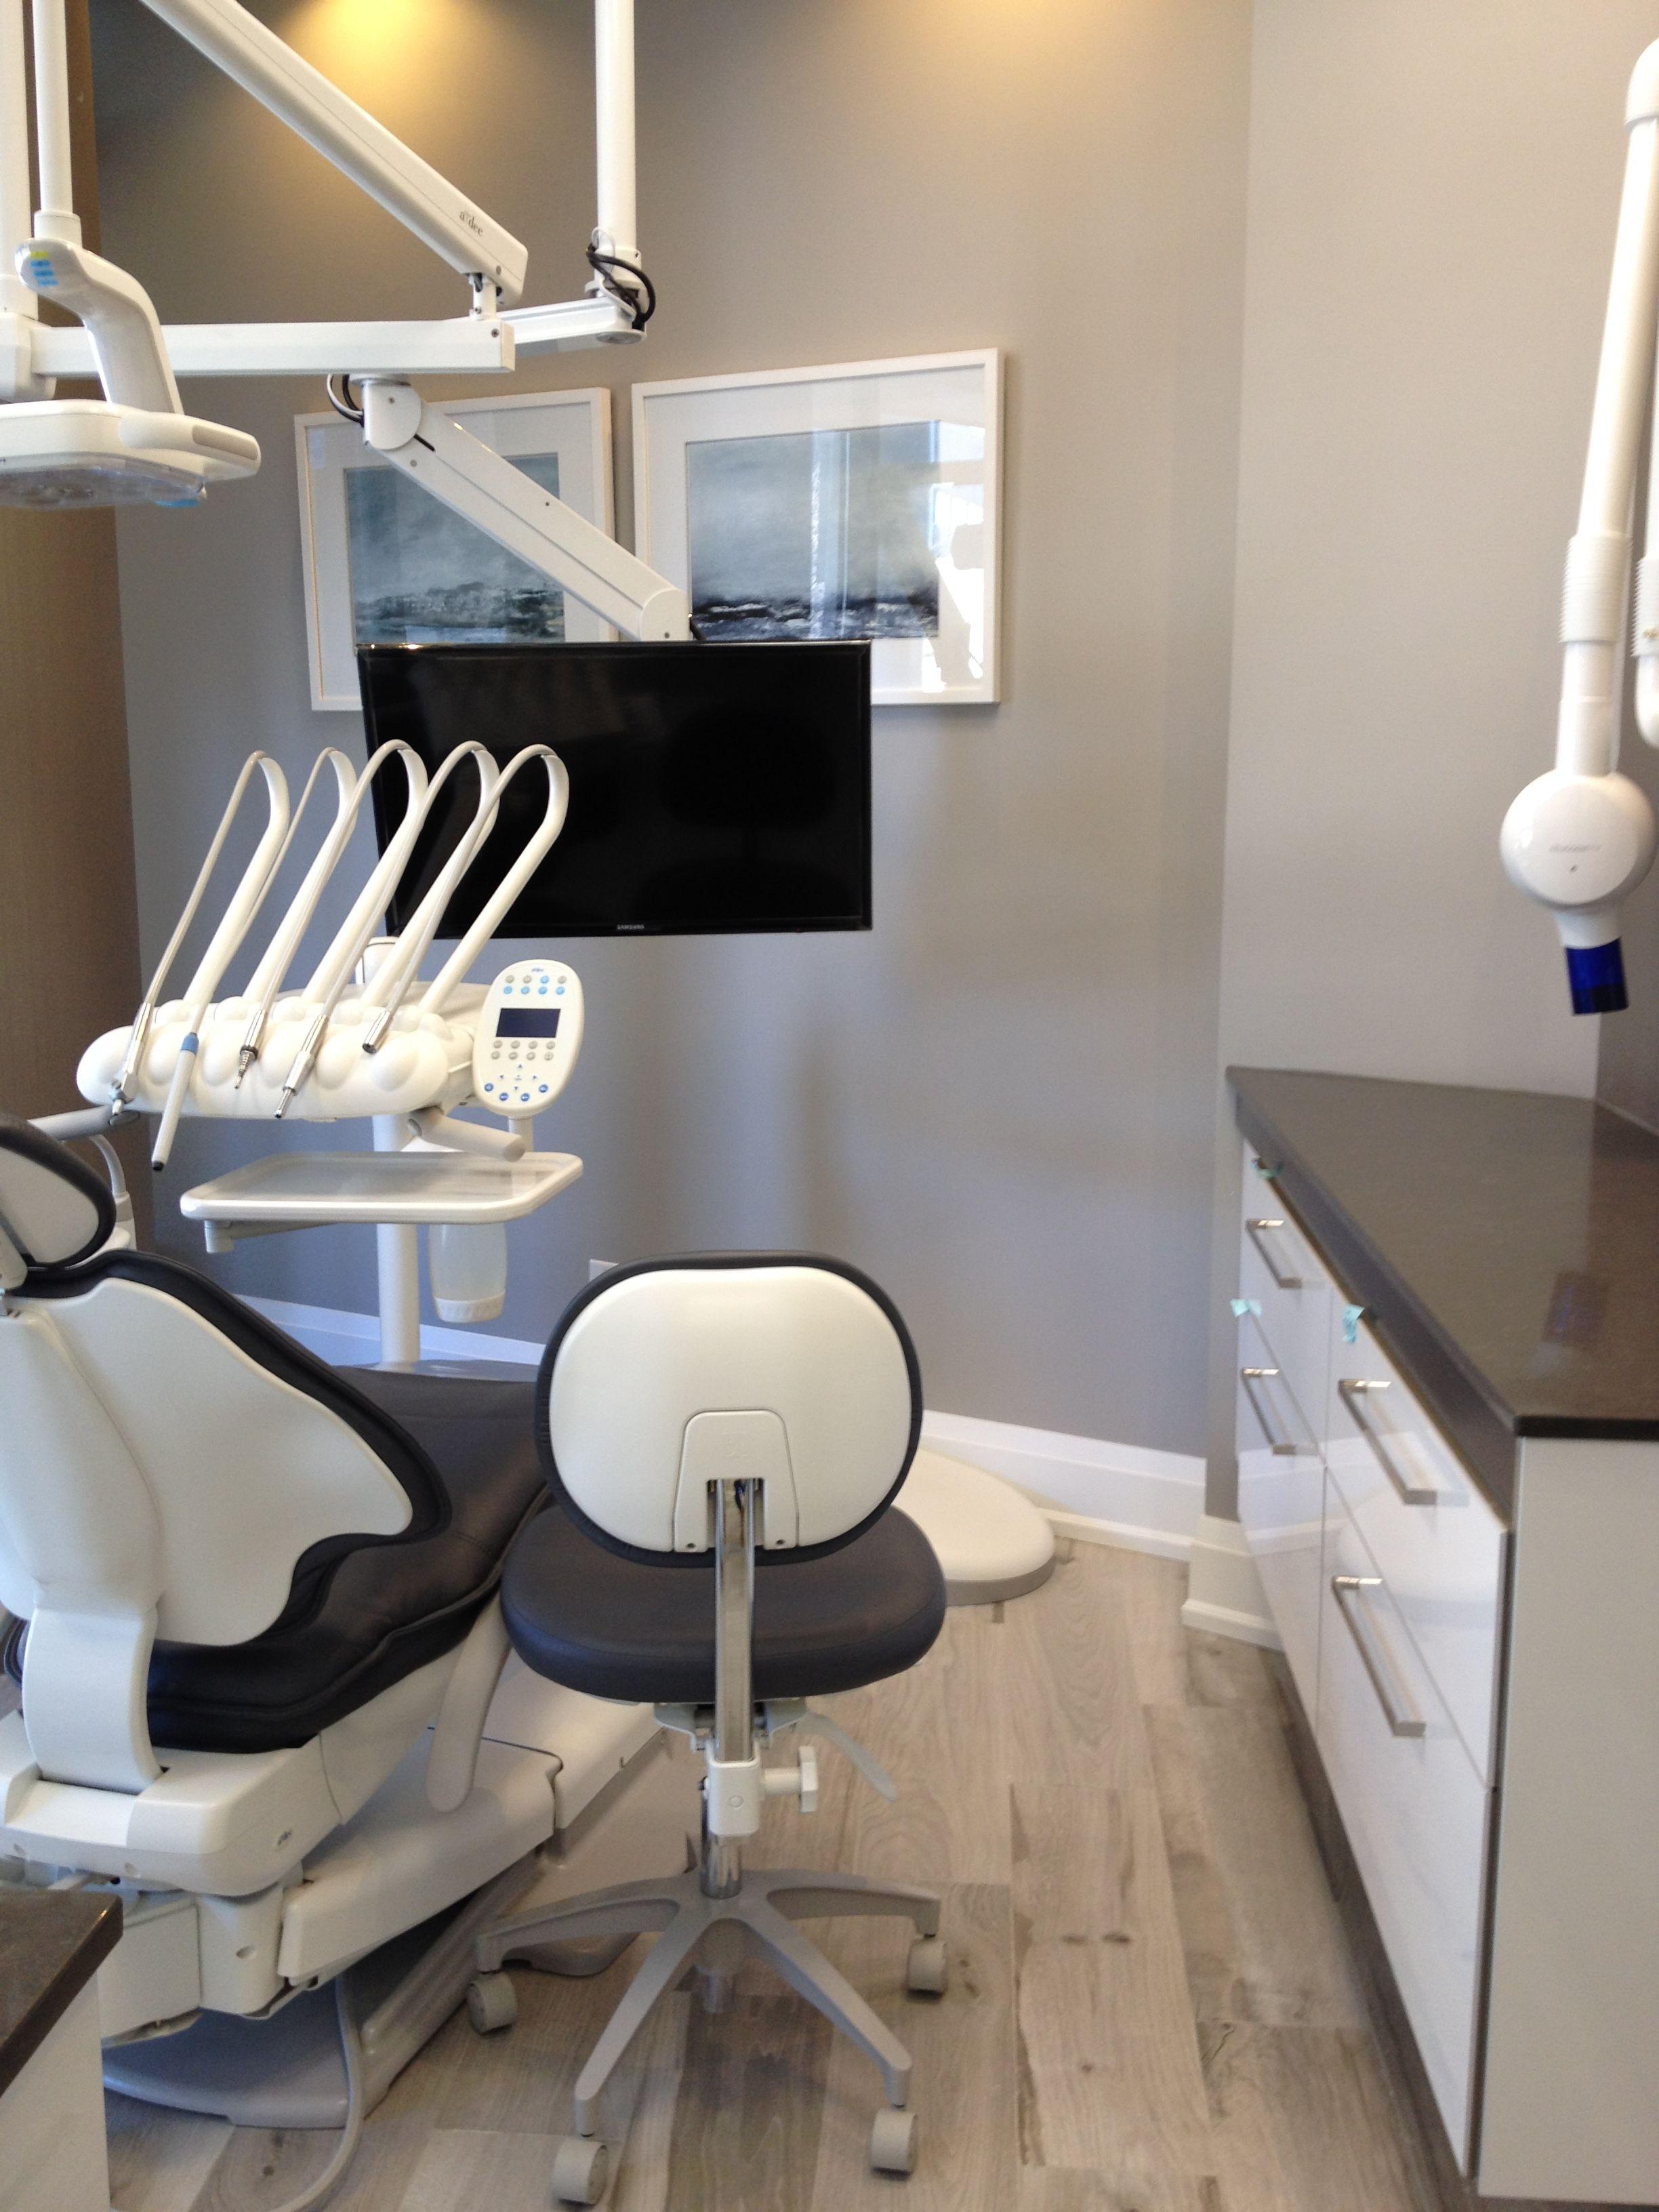 Dental Office  Adec 500   Pinteres